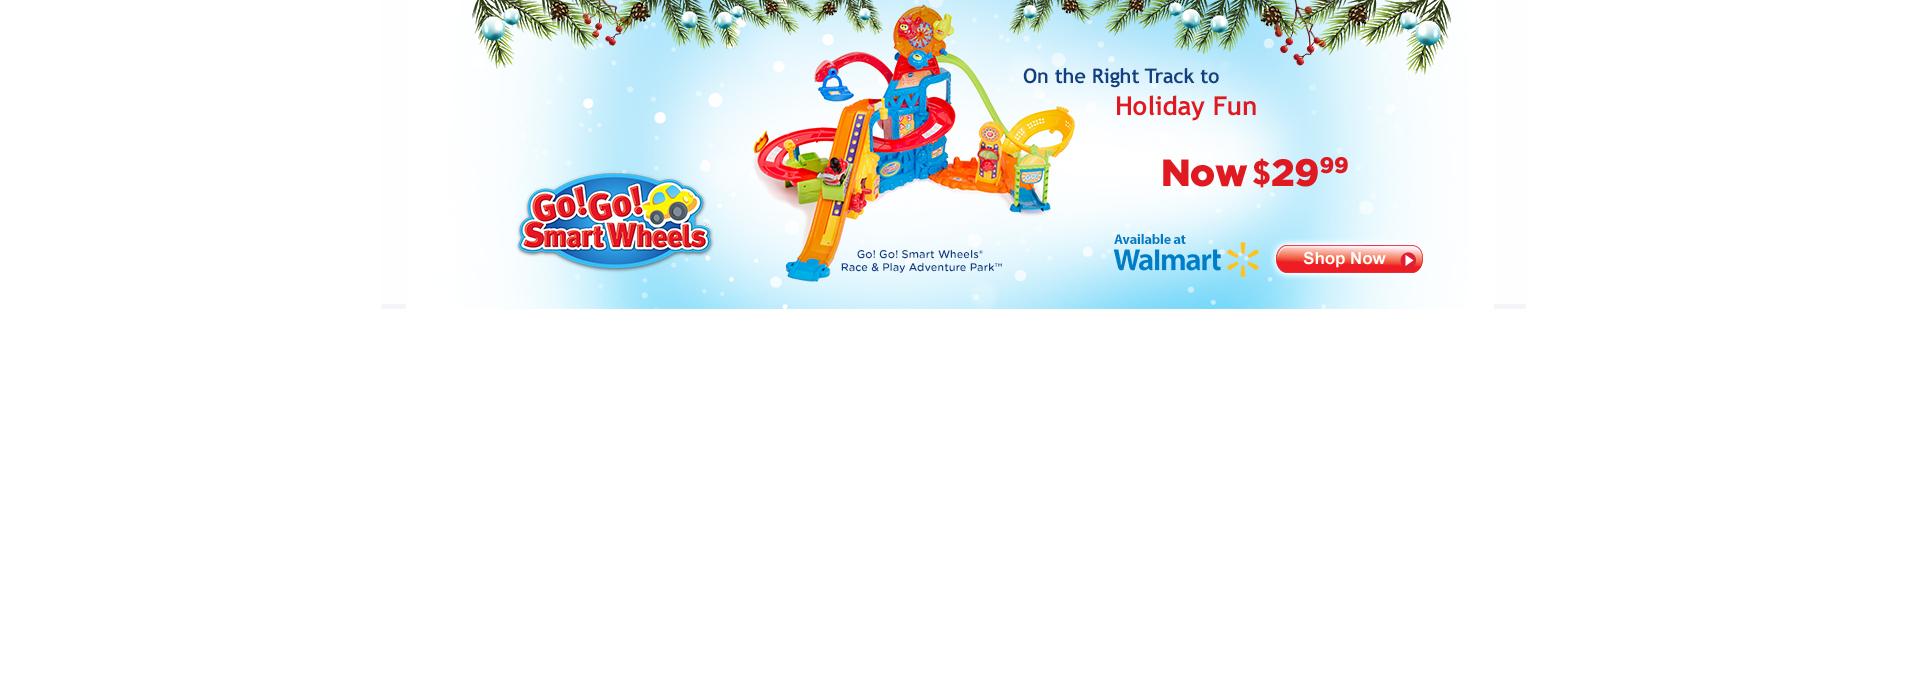 GGSW Race  Play Adventure Park - Walmart 29.99